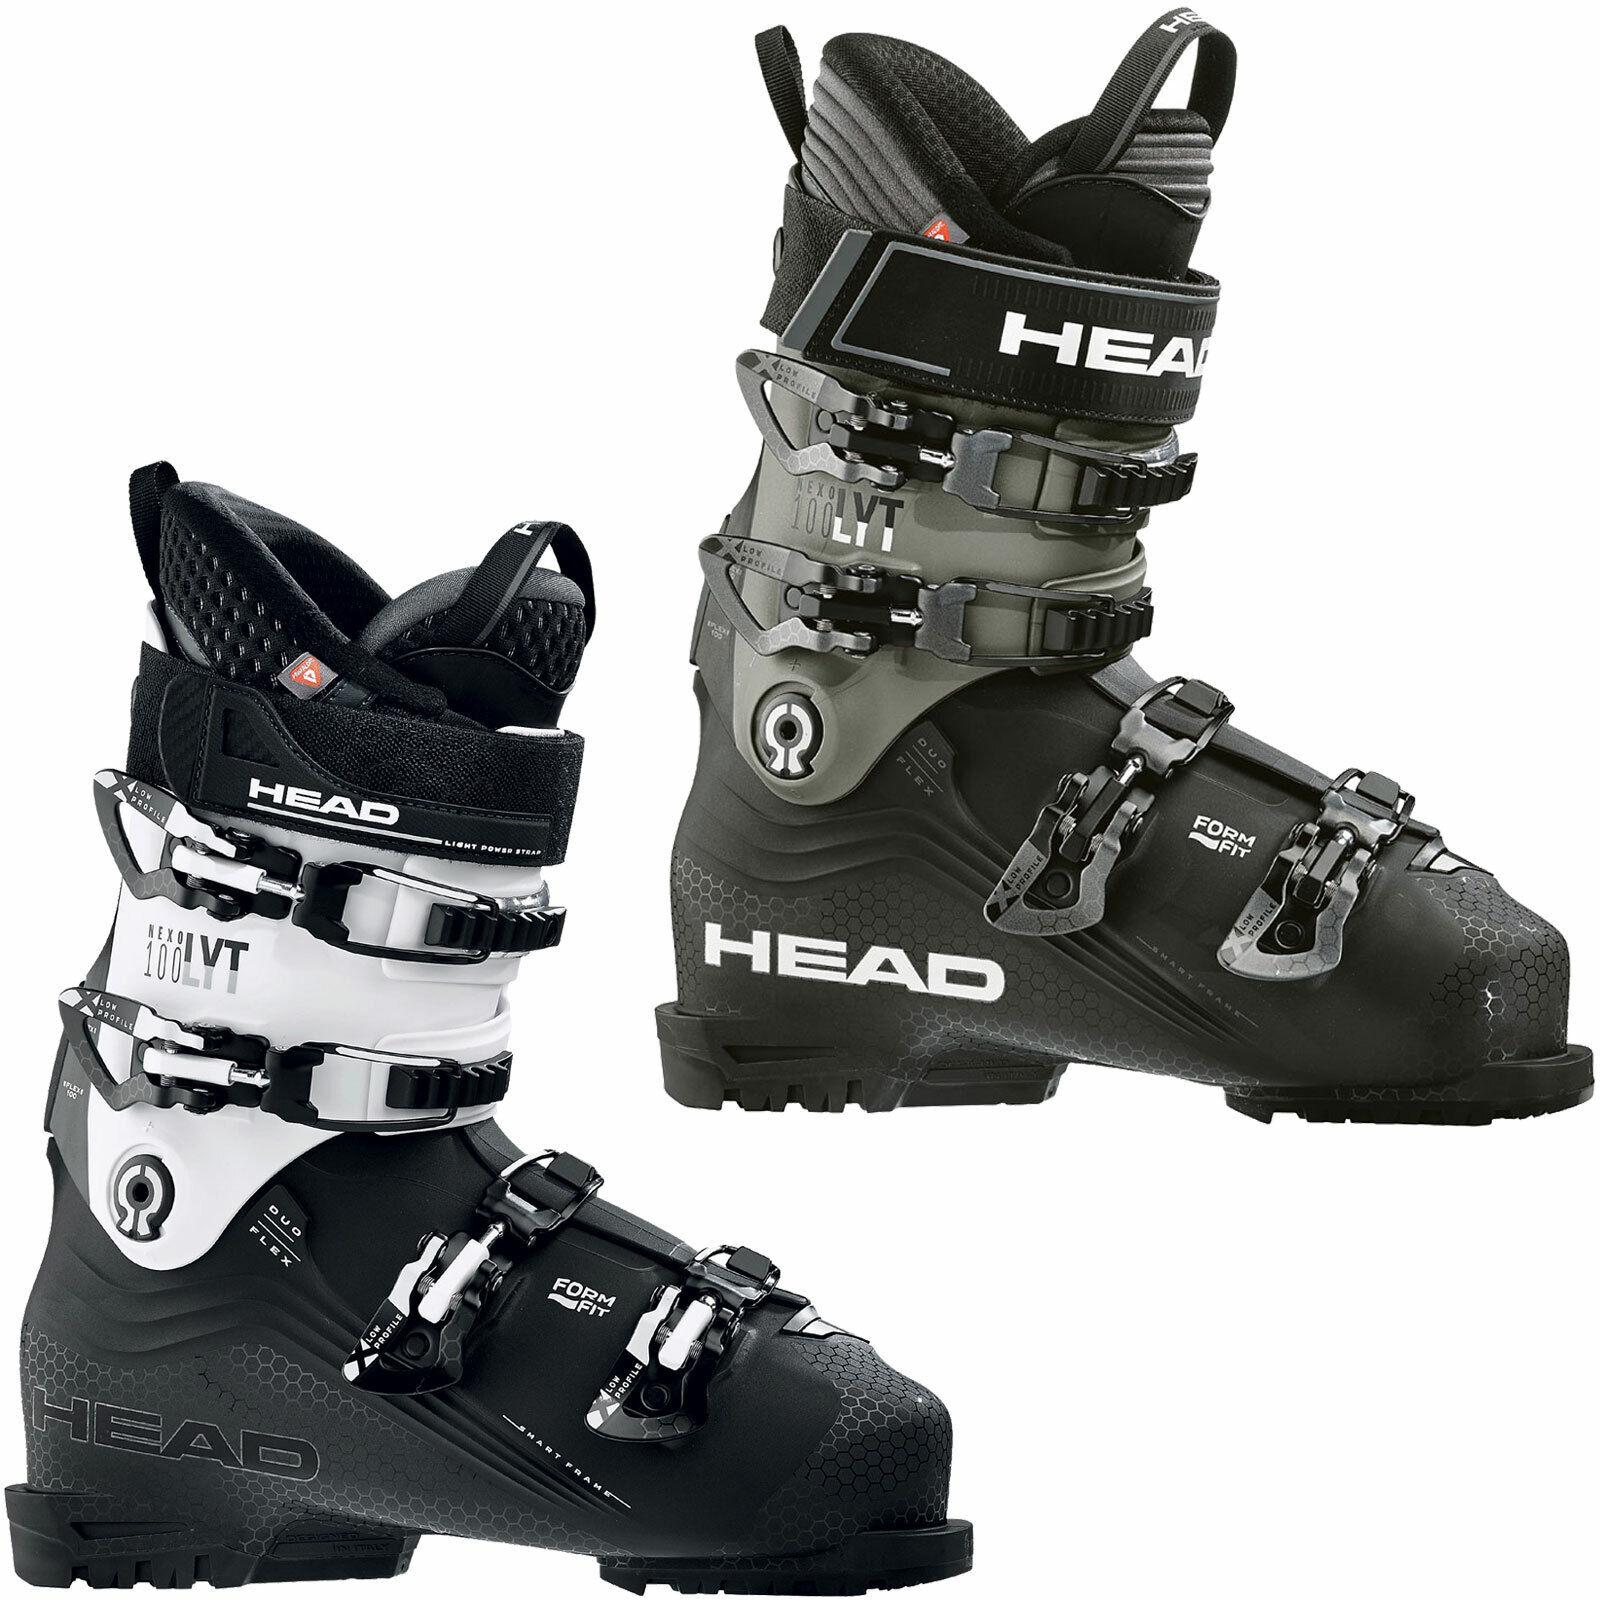 Head Nexo Lyt 100 Herren-Skischuhe Ski-Stiefel Skistiefel Stiefel SkiStiefel Alpin